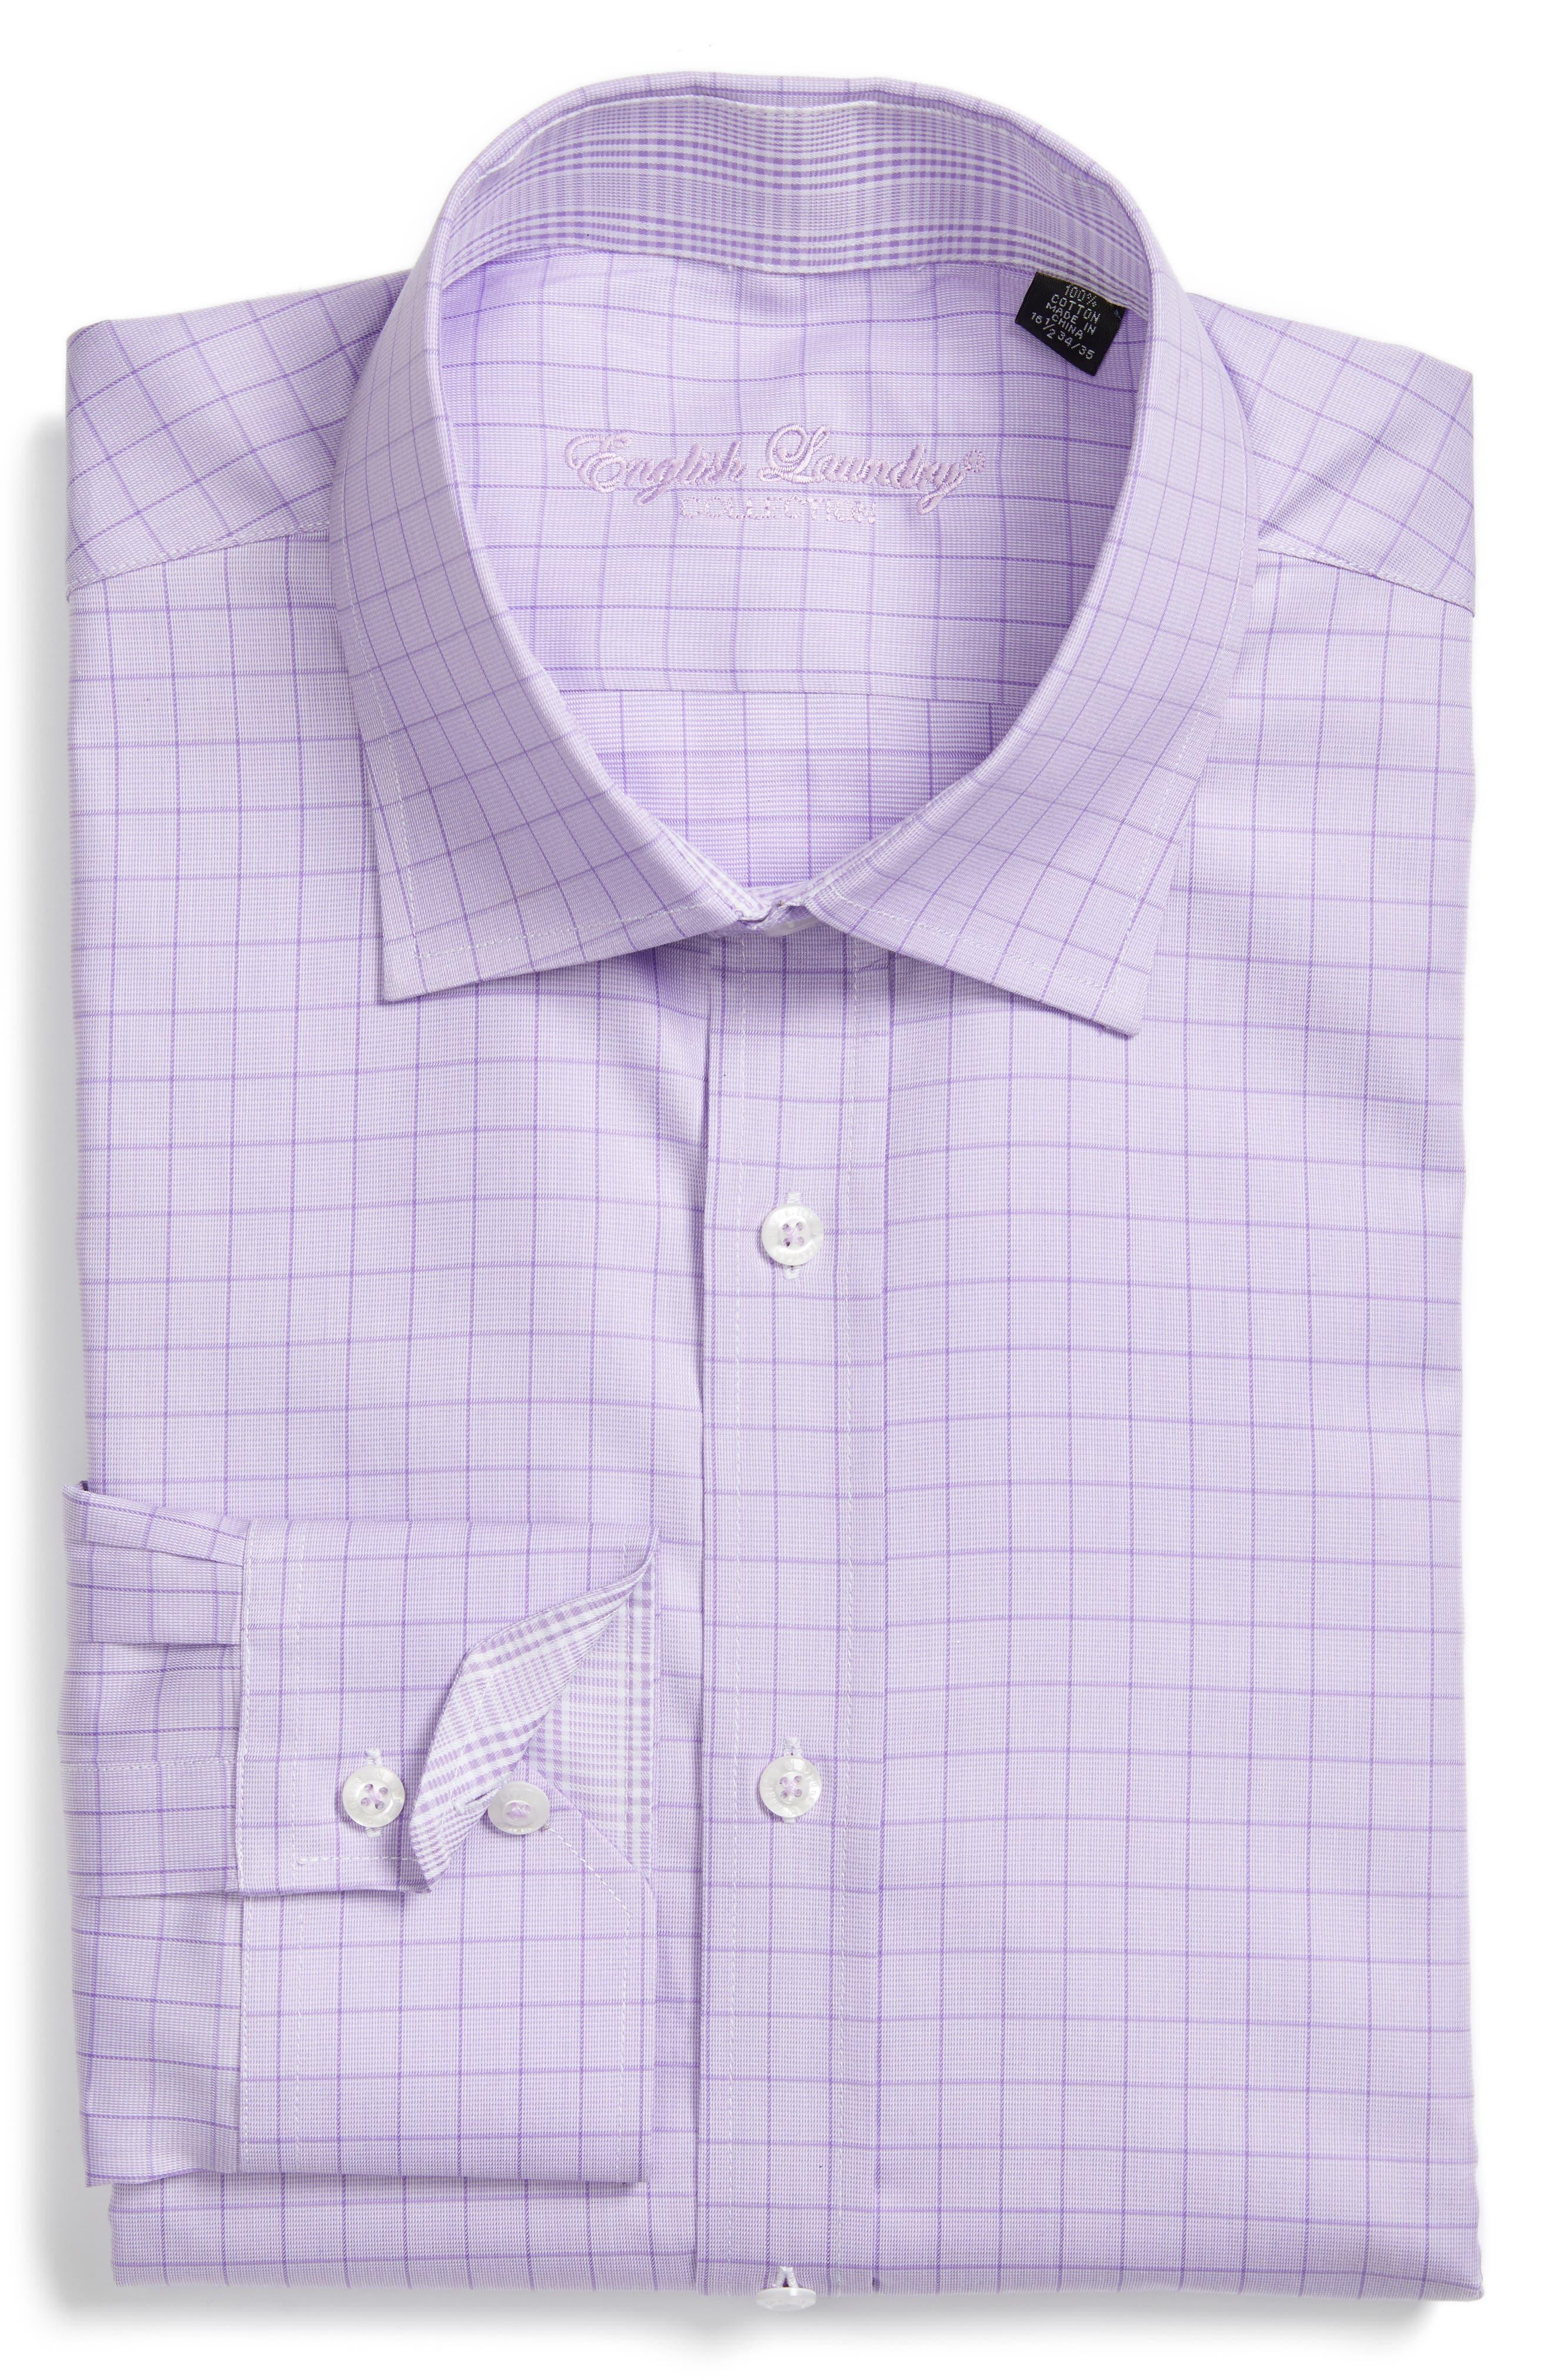 Trim Fit Check Dress Shirt,                             Main thumbnail 1, color,                             540